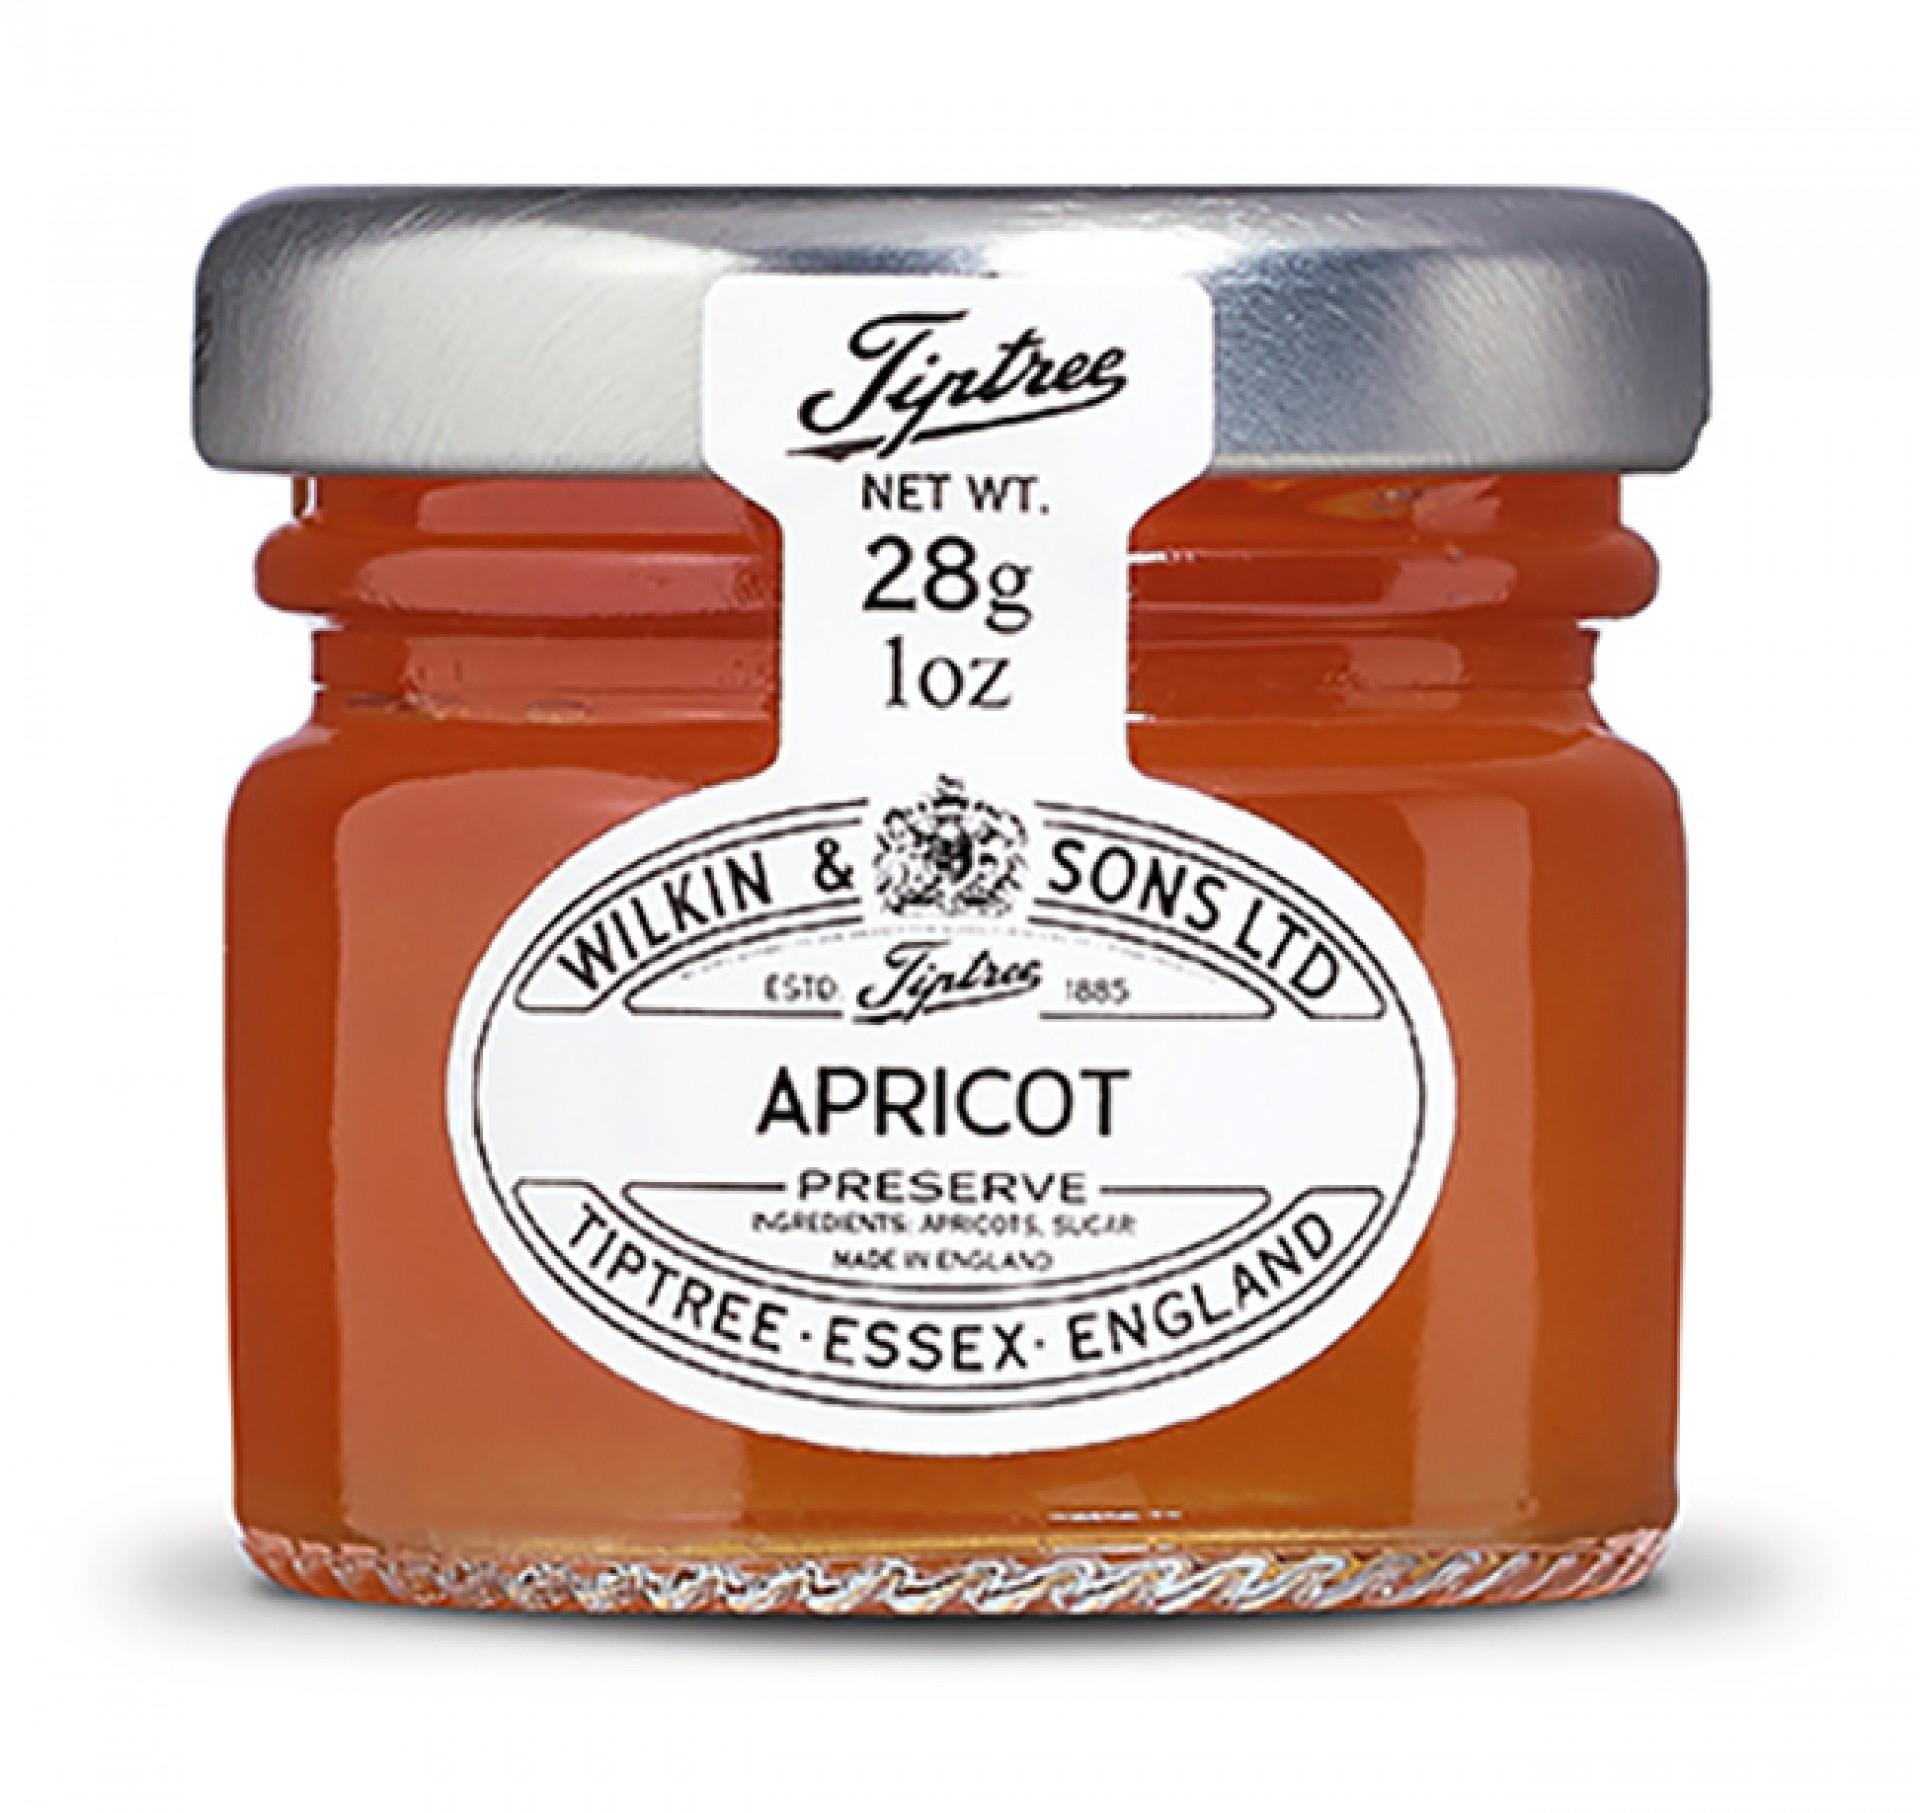 Tiptree Apricot Preserve